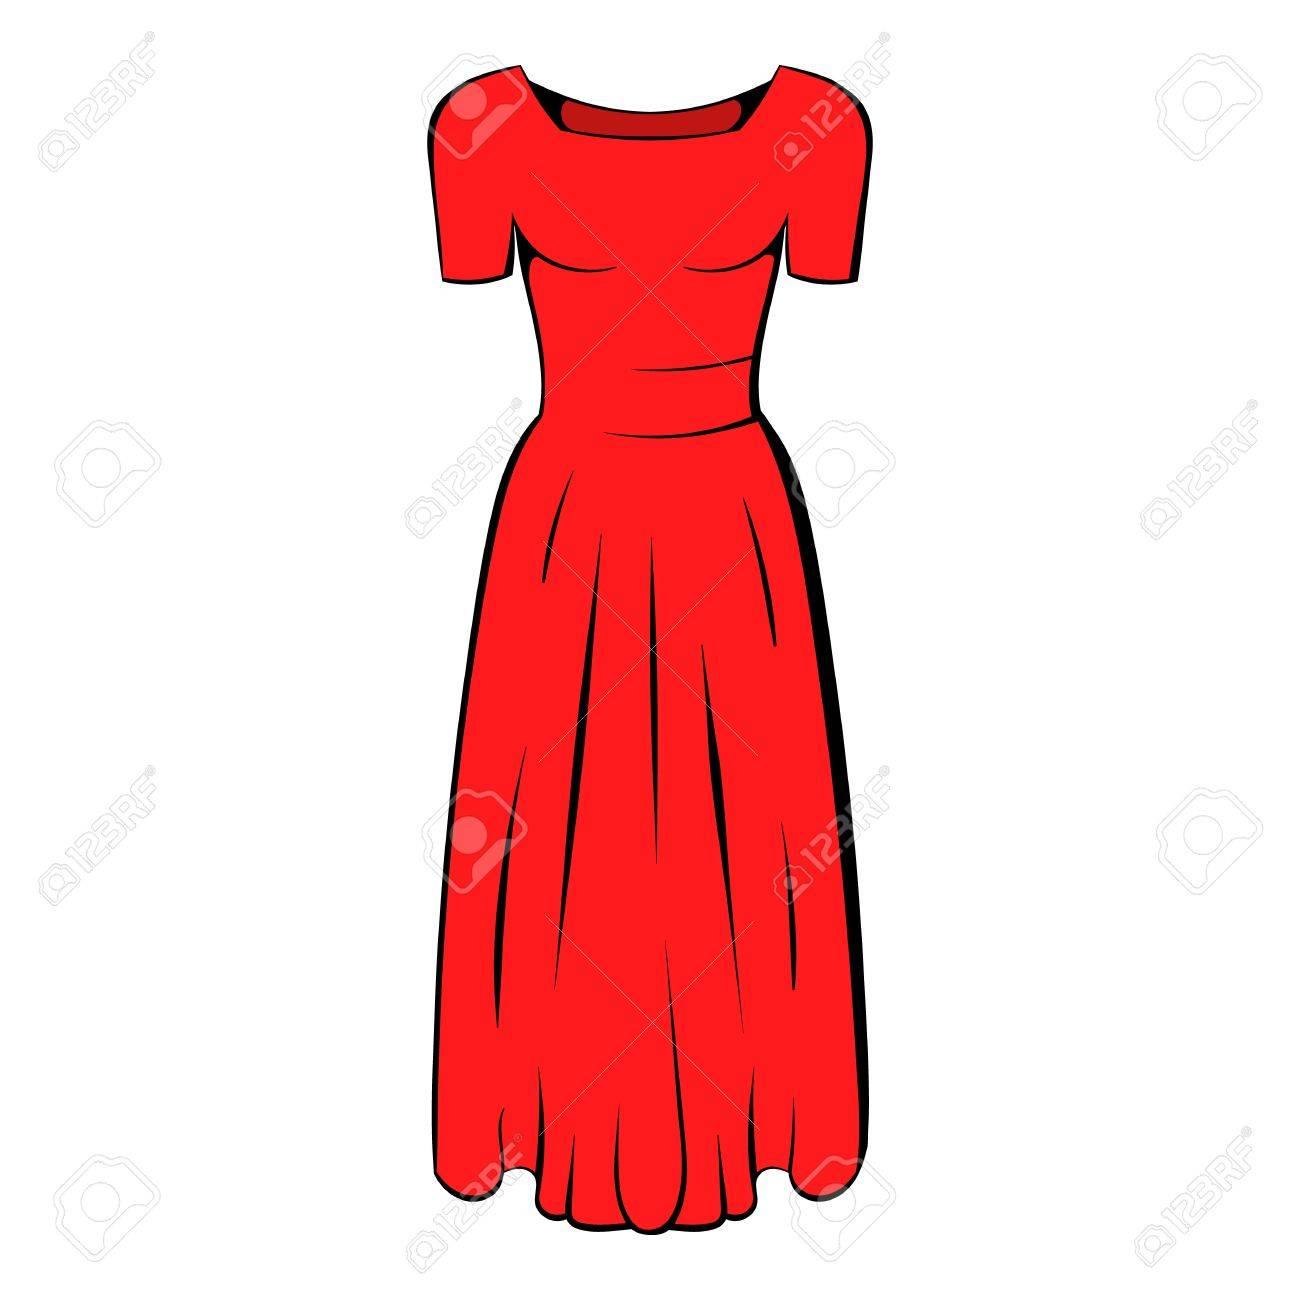 0d07003b7a357e Womens red dress icon cartoon Stock Vector - 73974407